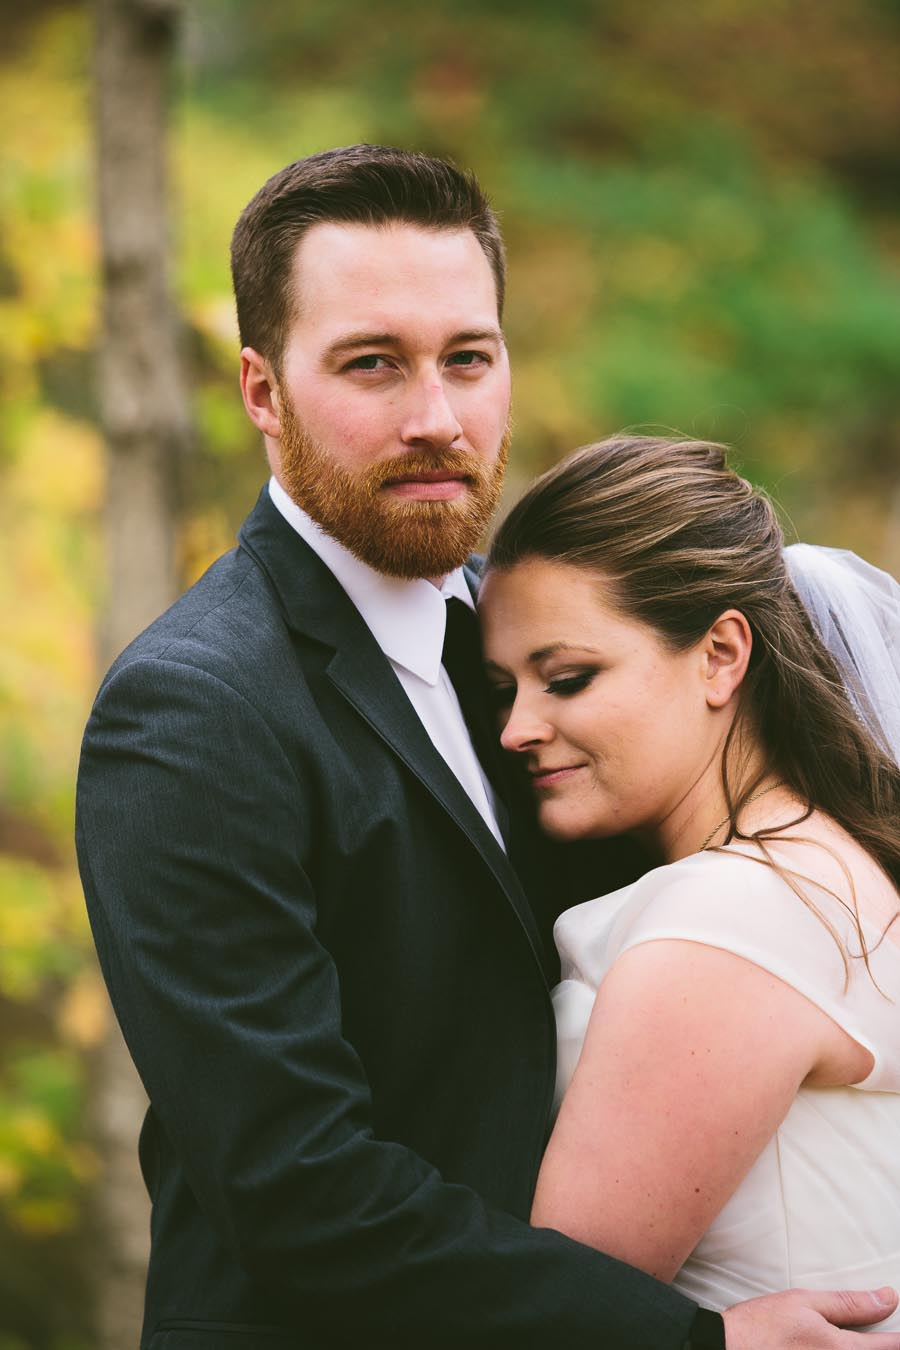 landolls-mohican-castle-wedding-photography-23.jpg